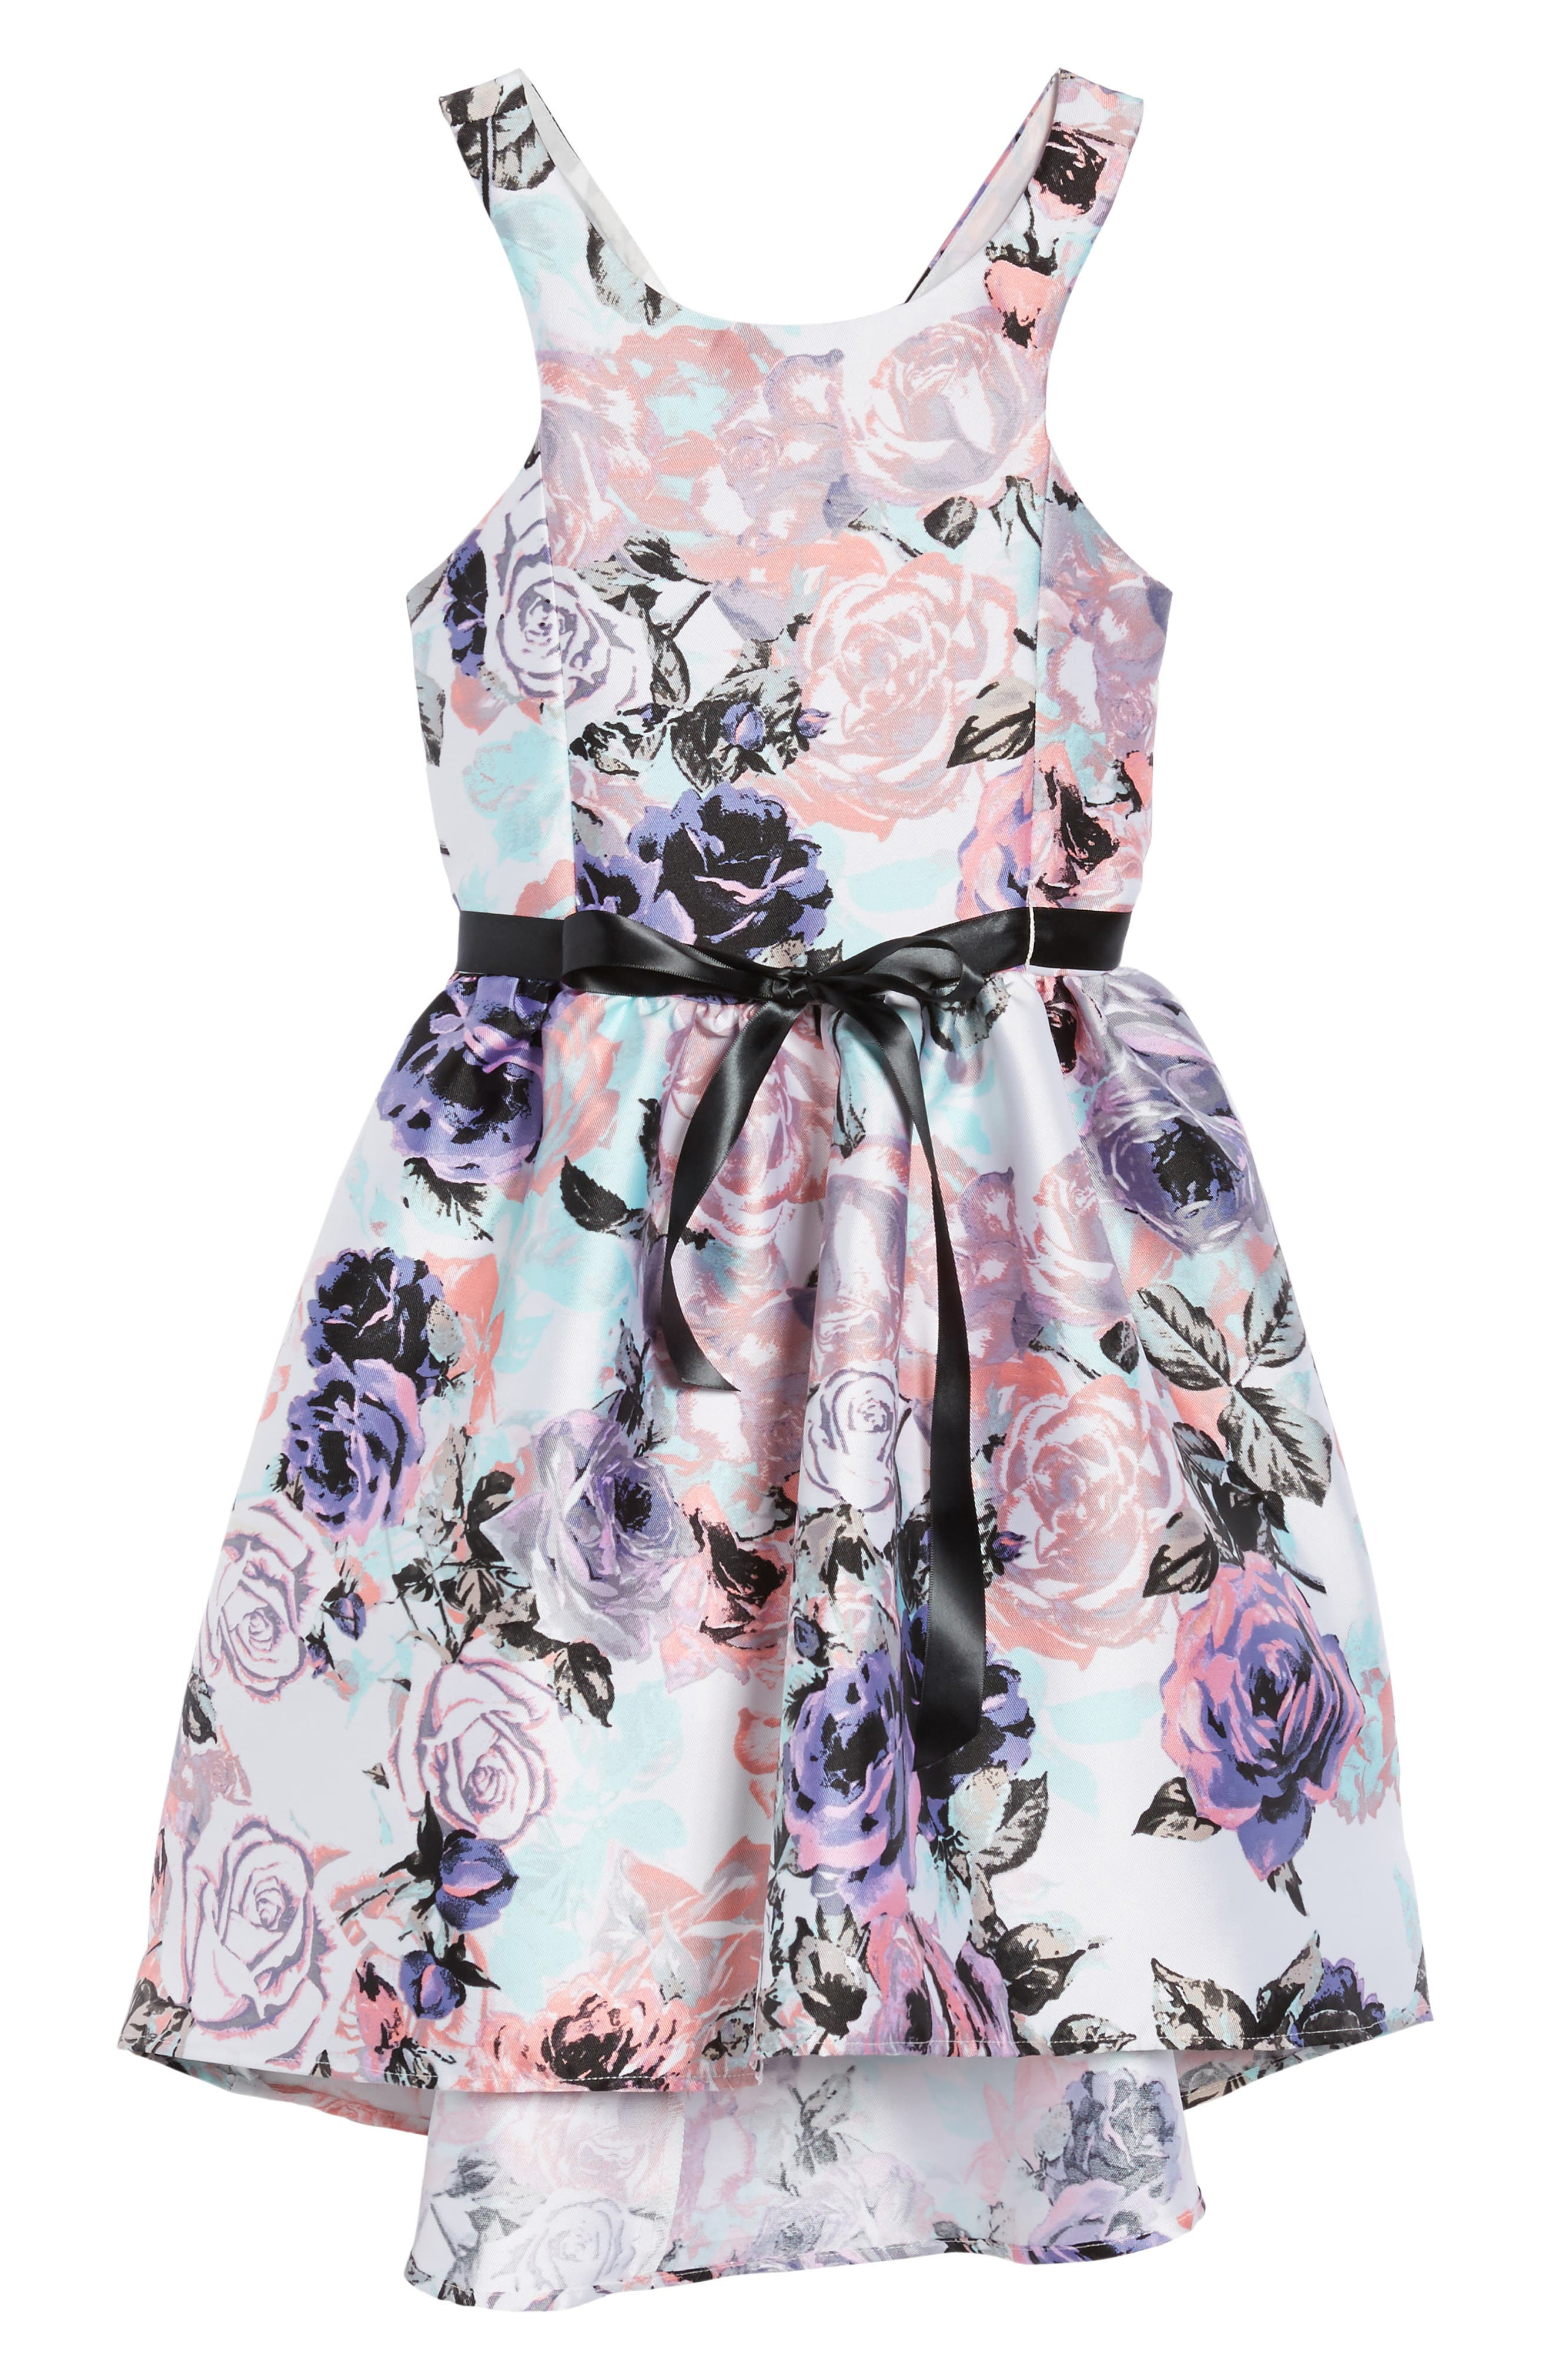 Floral Print Party Dress,                             Main thumbnail 1, color,                             Lilac/ Blush